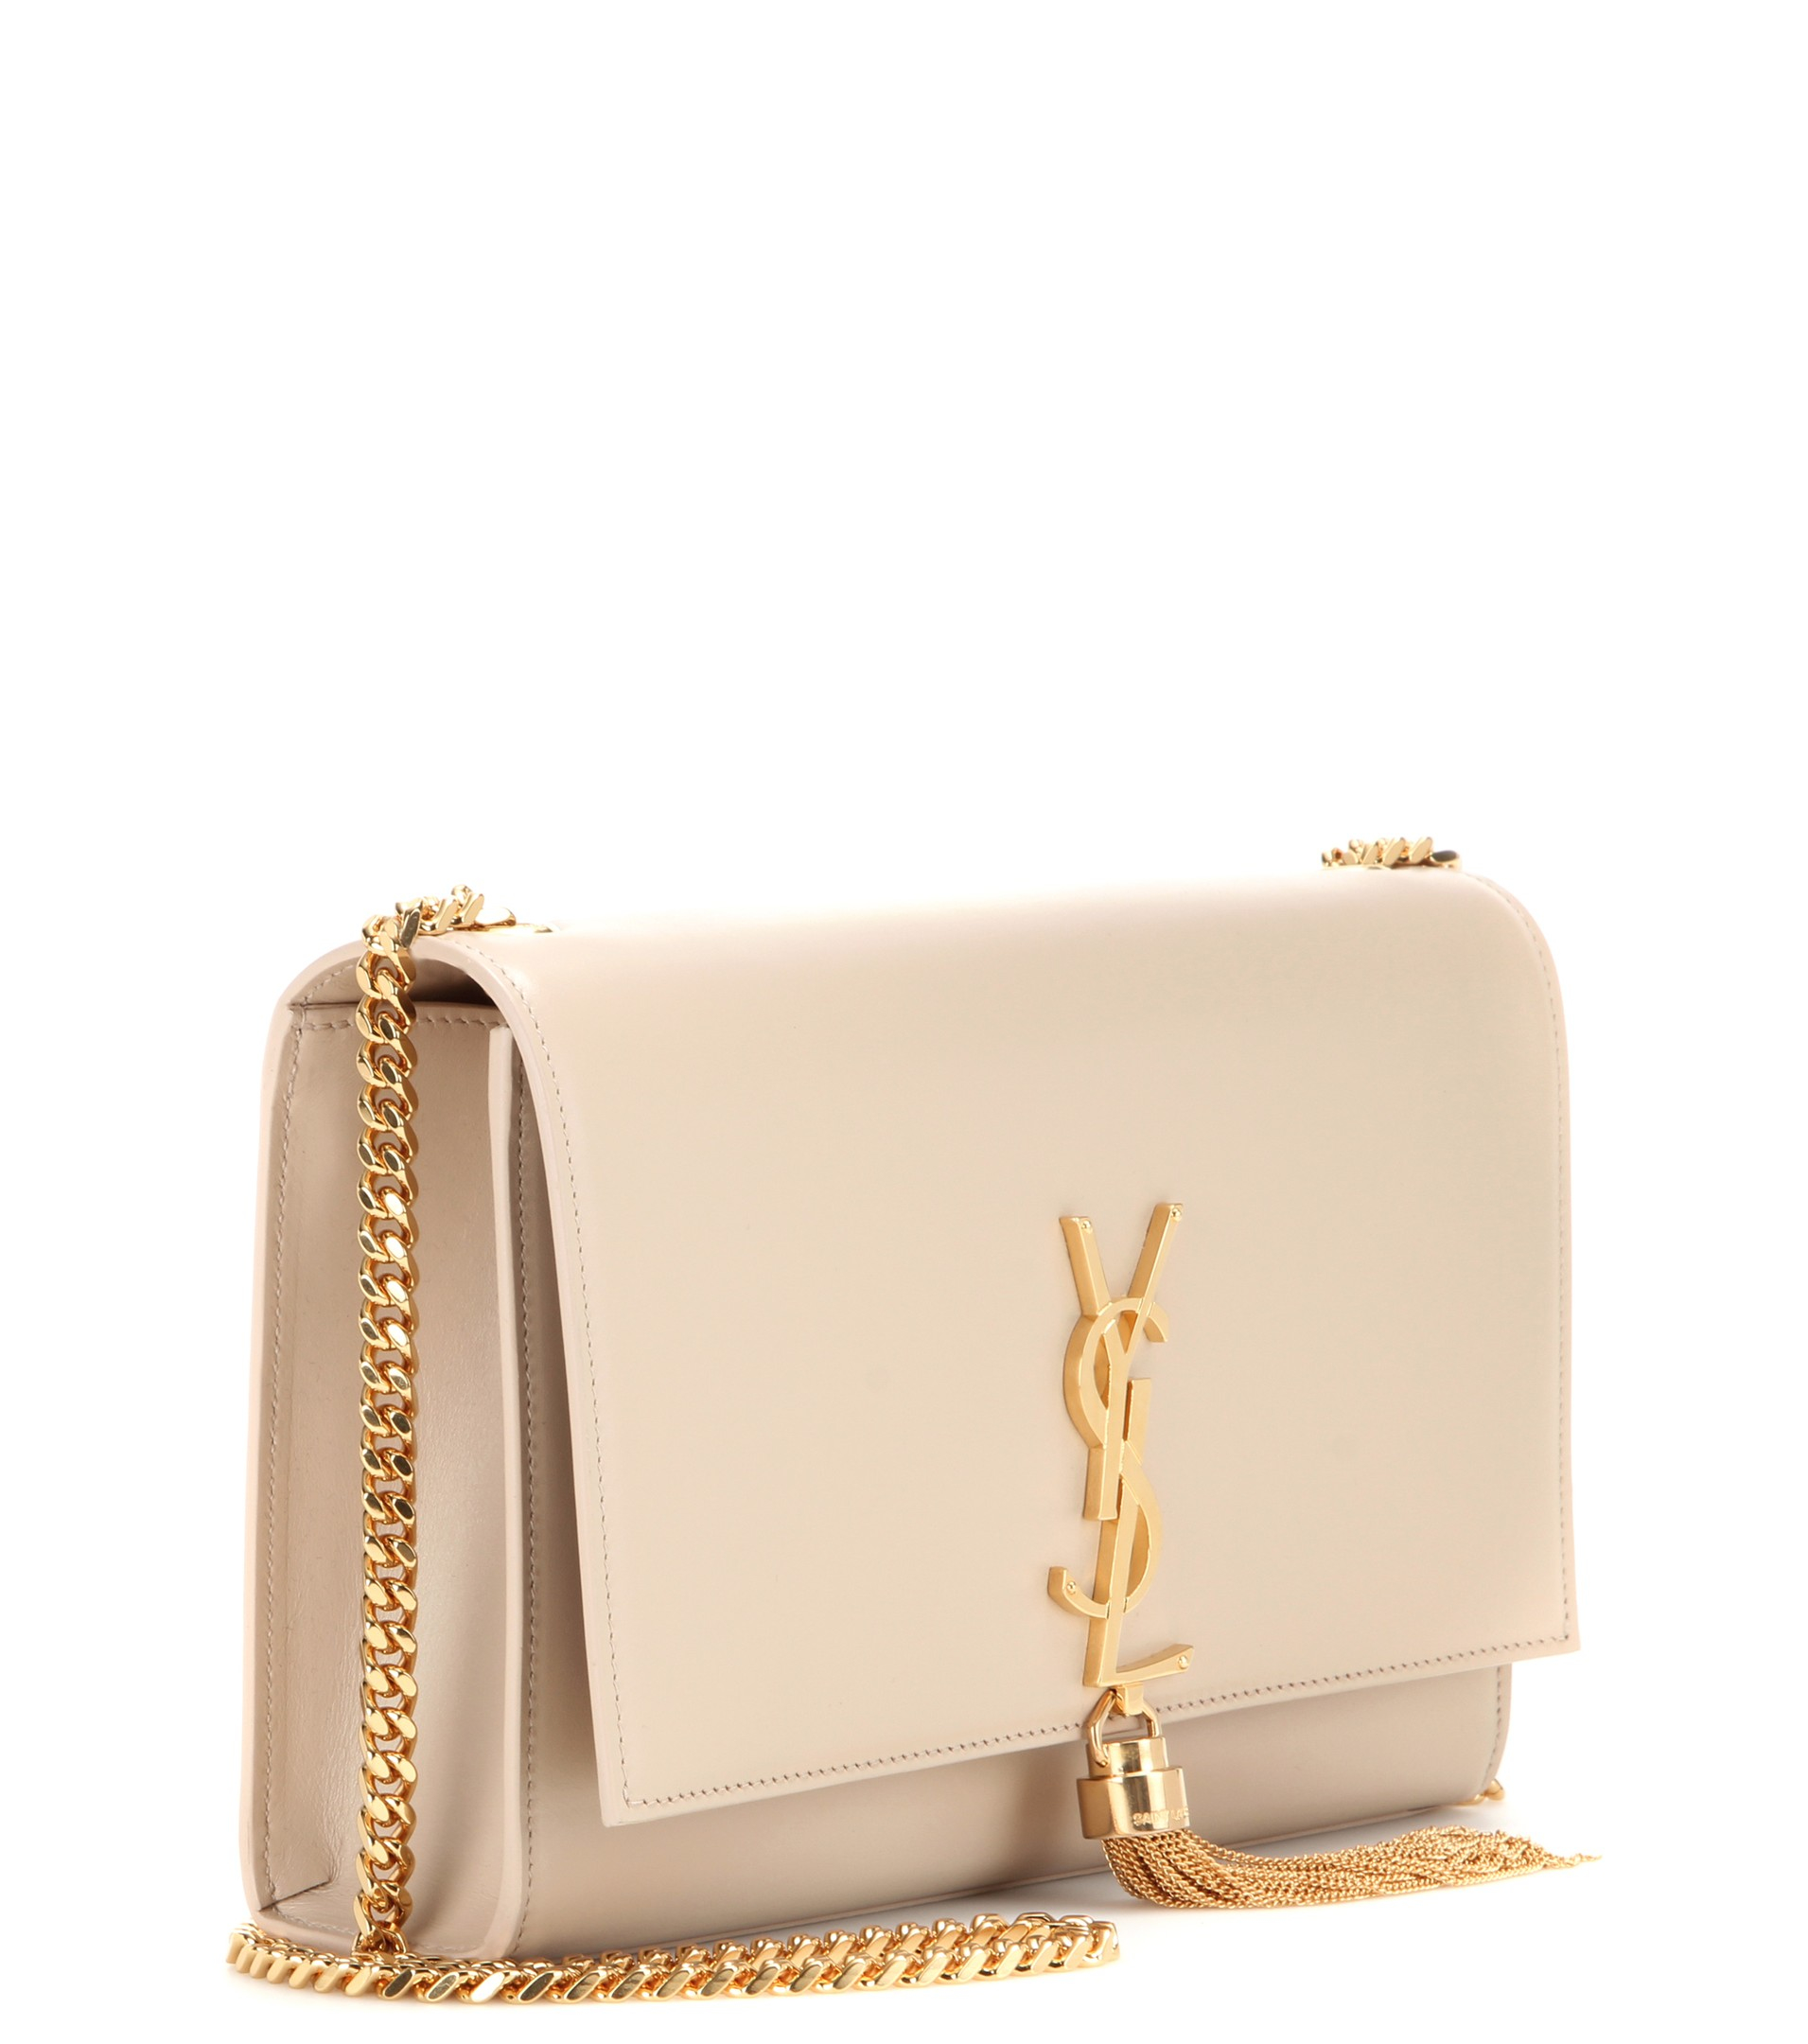 a38a1c7c424 Saint Laurent Classic Small Monogram Leather Shoulder Bag in Pink - Lyst